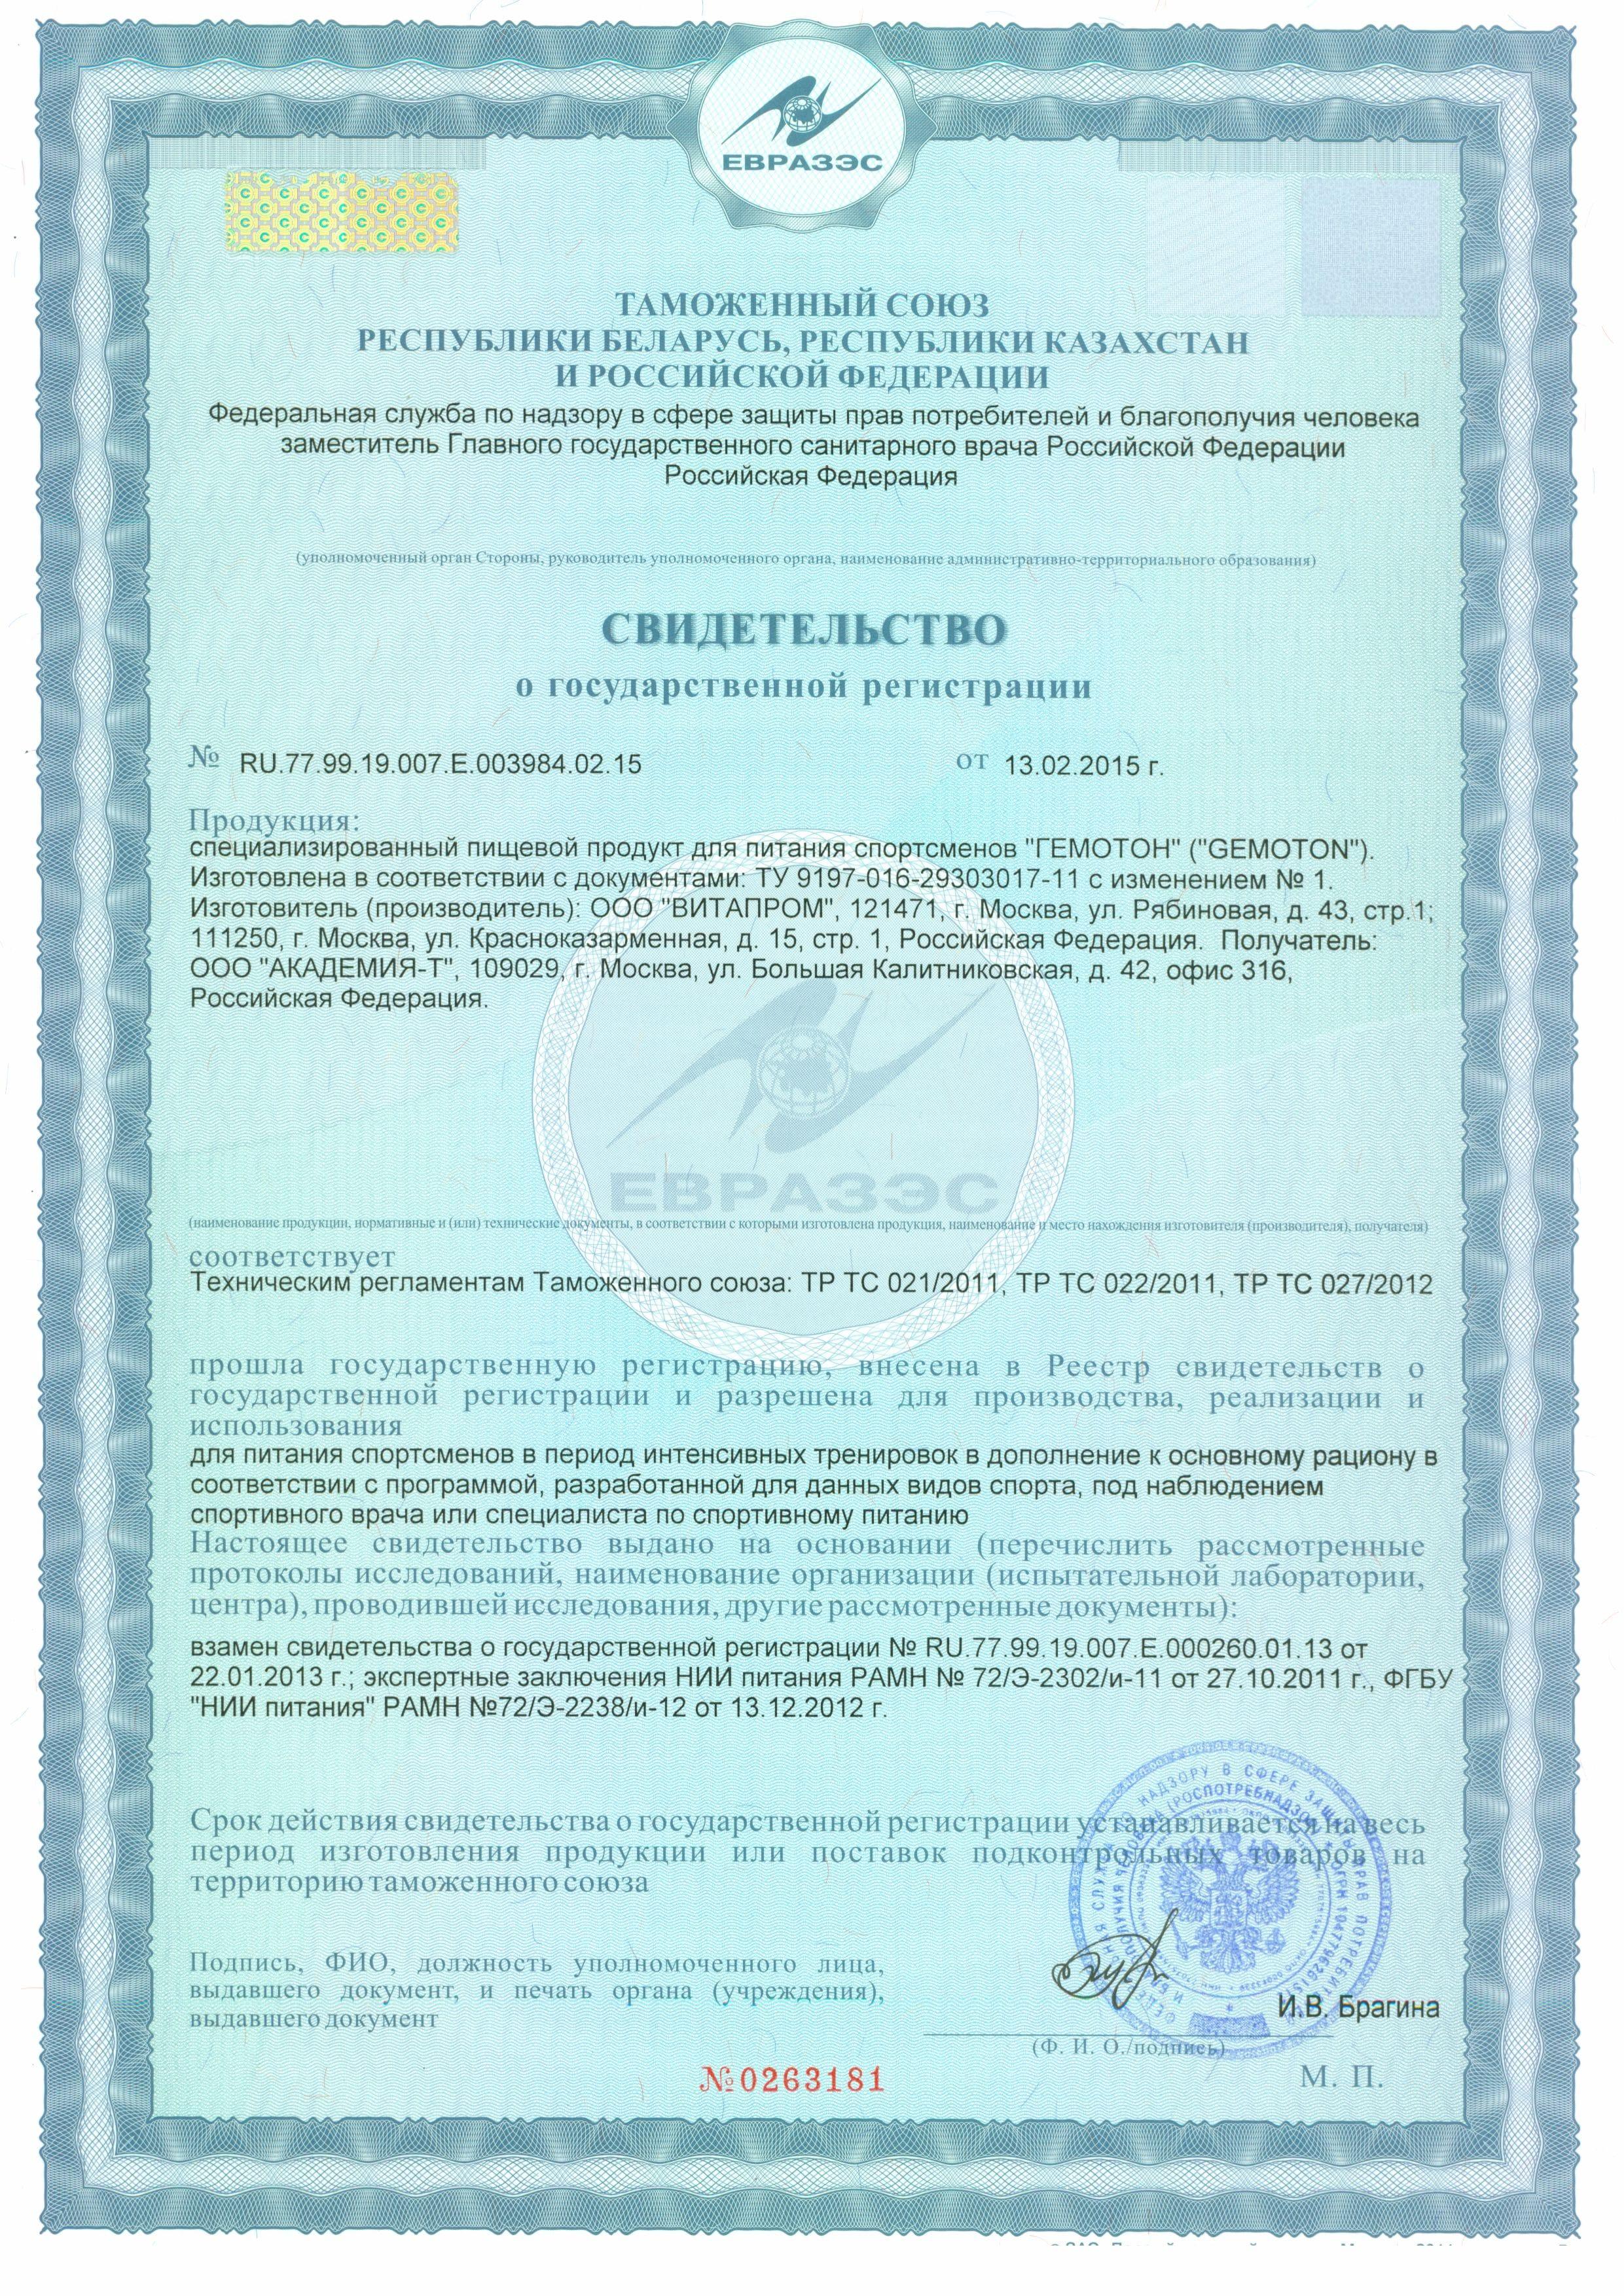 Сертификат GEMOTON®